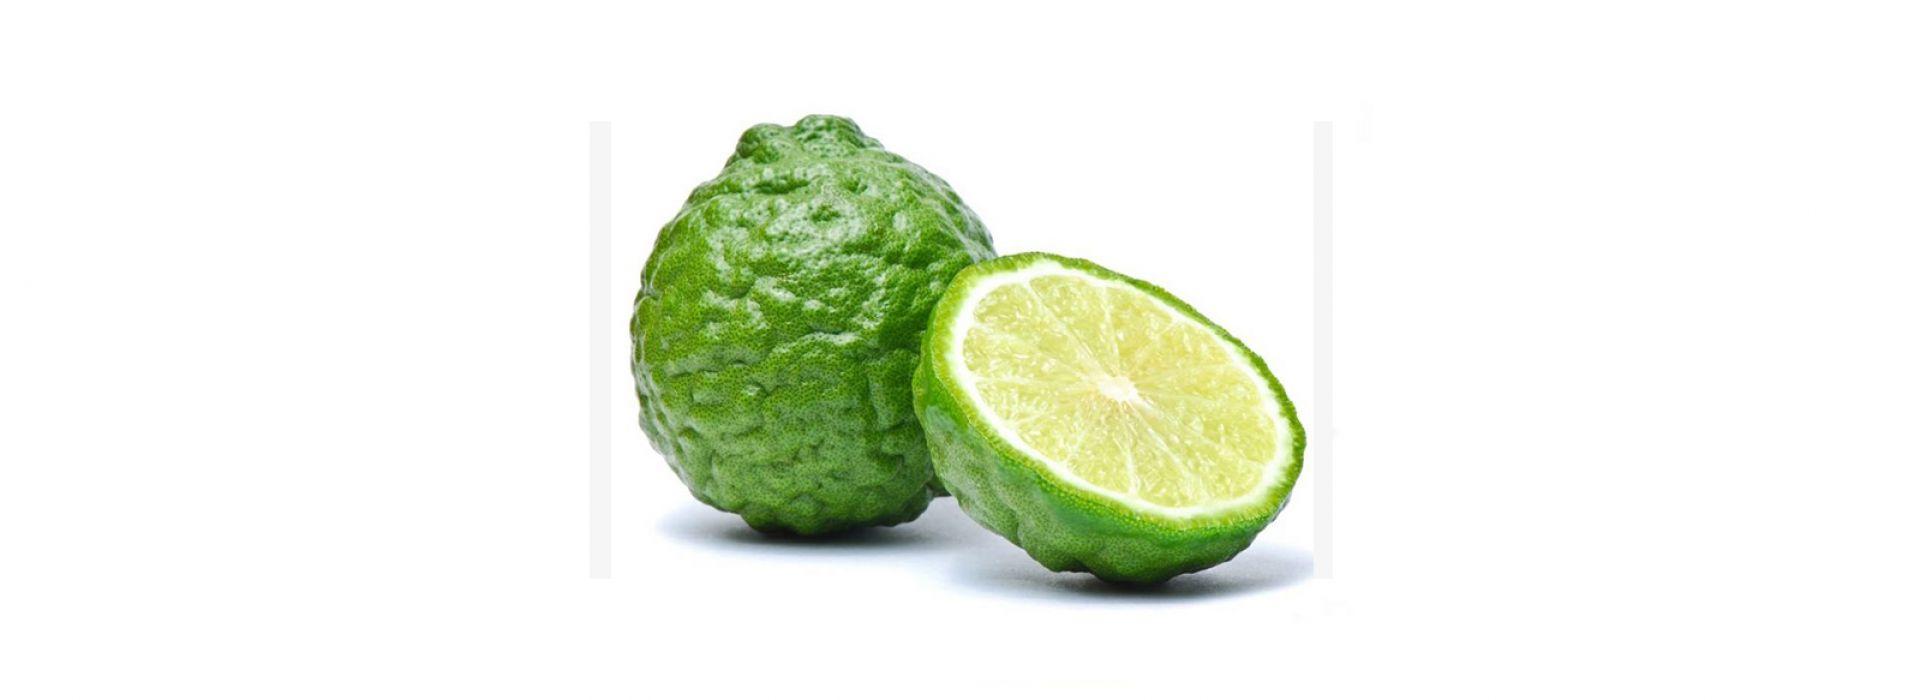 Kaffir Lime Fruit